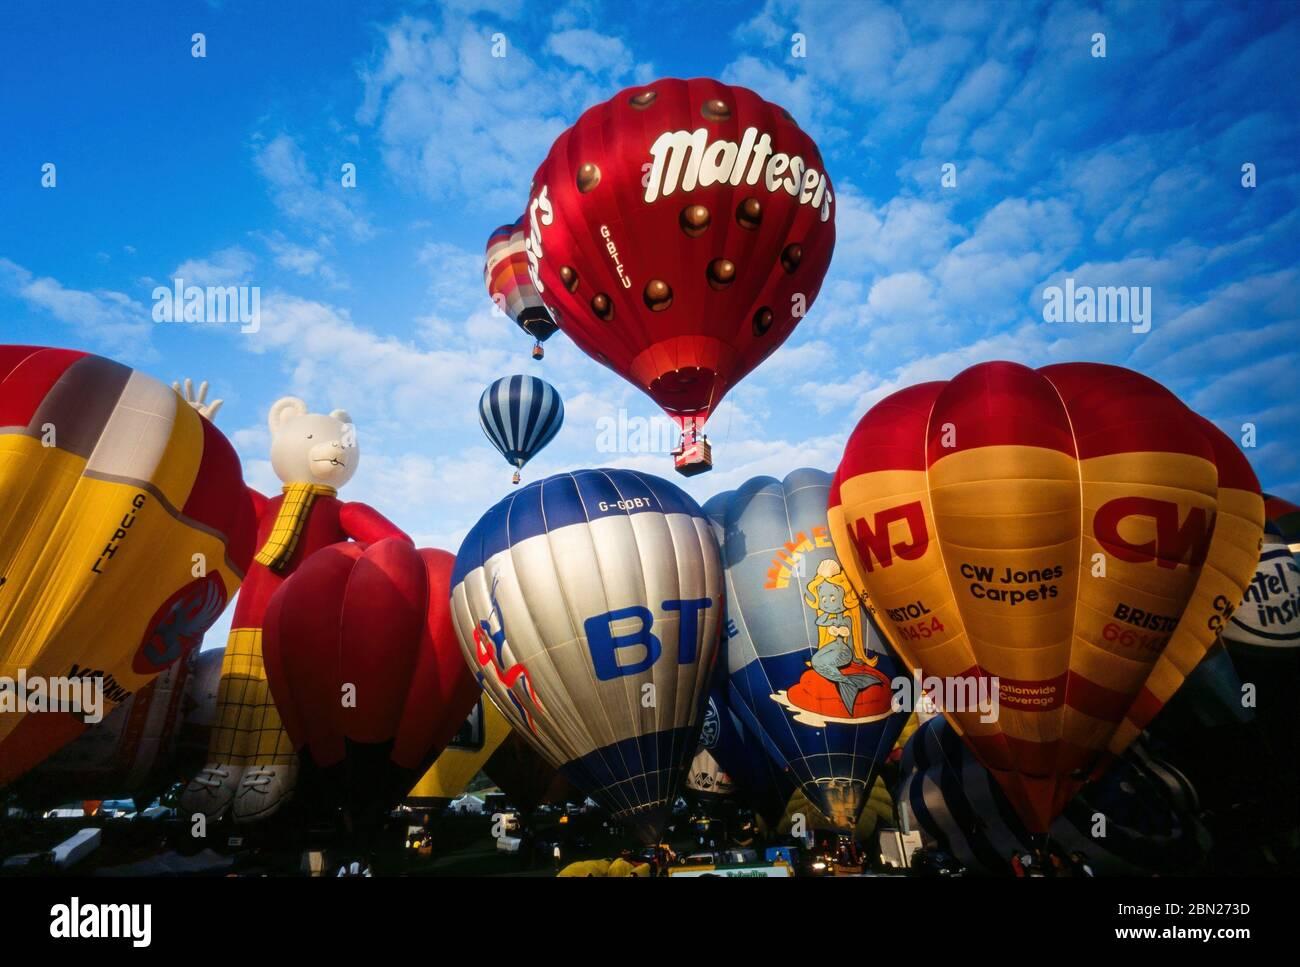 Early morning mass ascent of colourful hot air balloons at the Bristol International Balloon Fiesta, Ashton Court, Bristol, England, UK Stock Photo